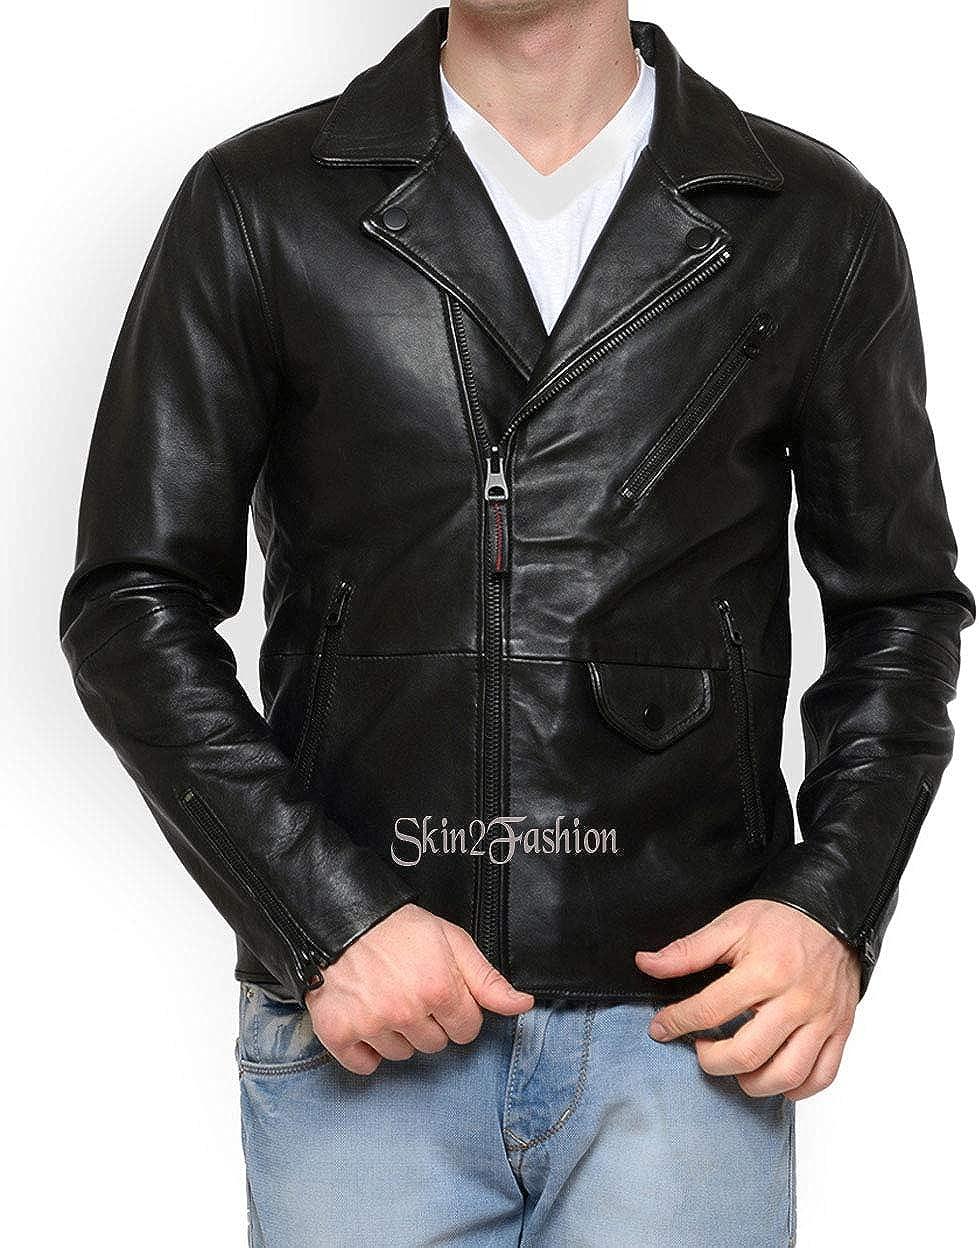 Mens Leather Jackets Motorcycle Bomber Biker Genuine Lambskin 495